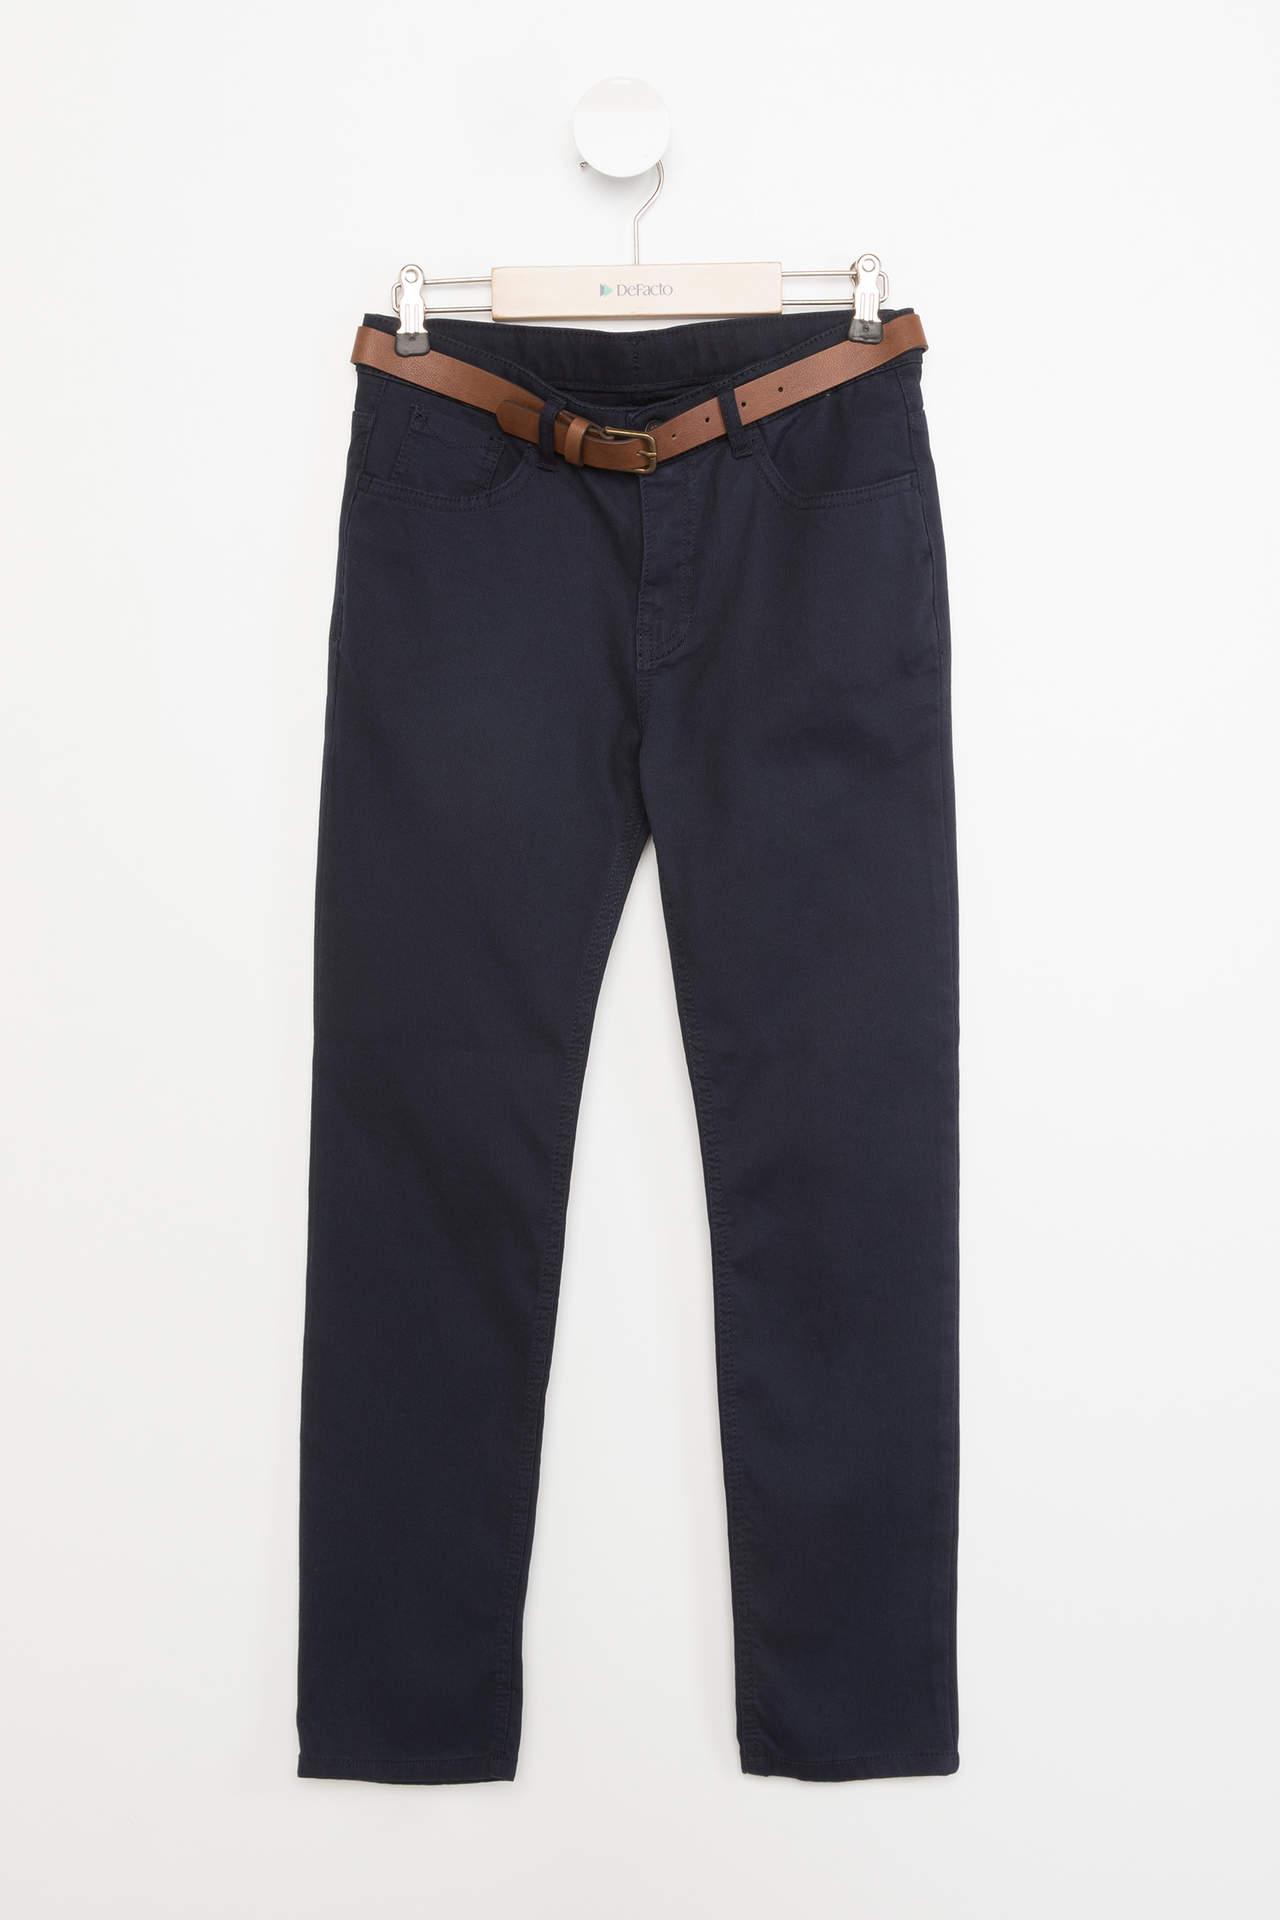 DeFacto Erkek Çocuk Kemerli Slim Fit Pantolon Lacivert male